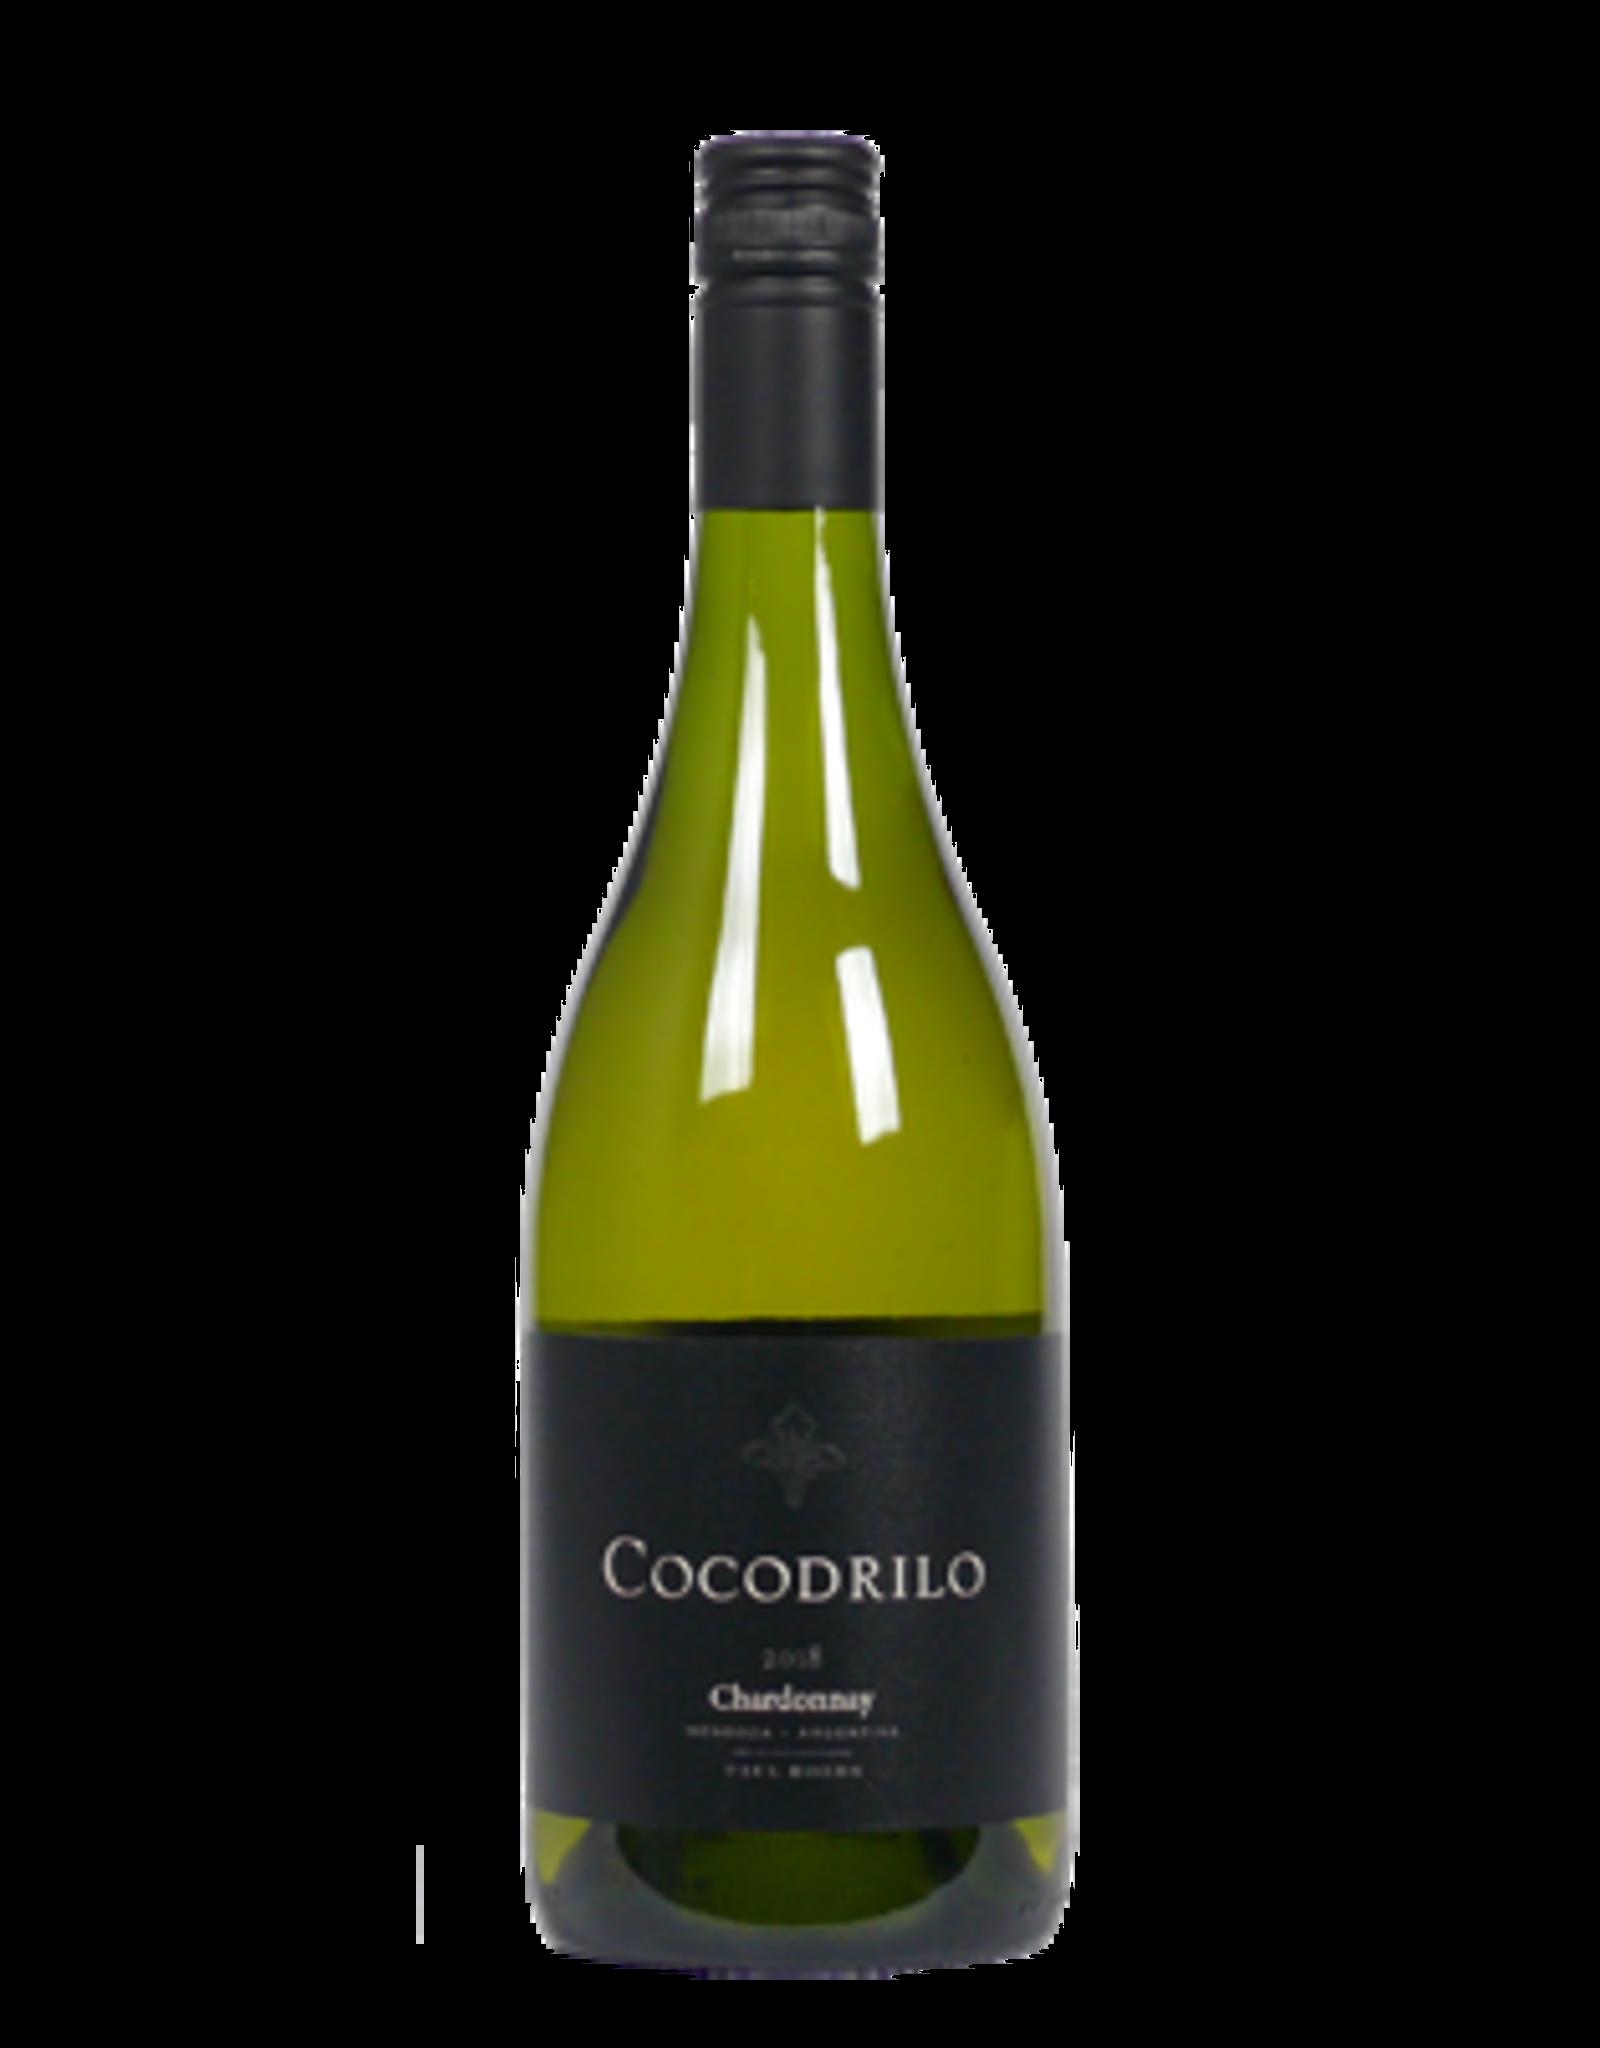 Paul Hobb Wines Cocoddrilo Chardonnay